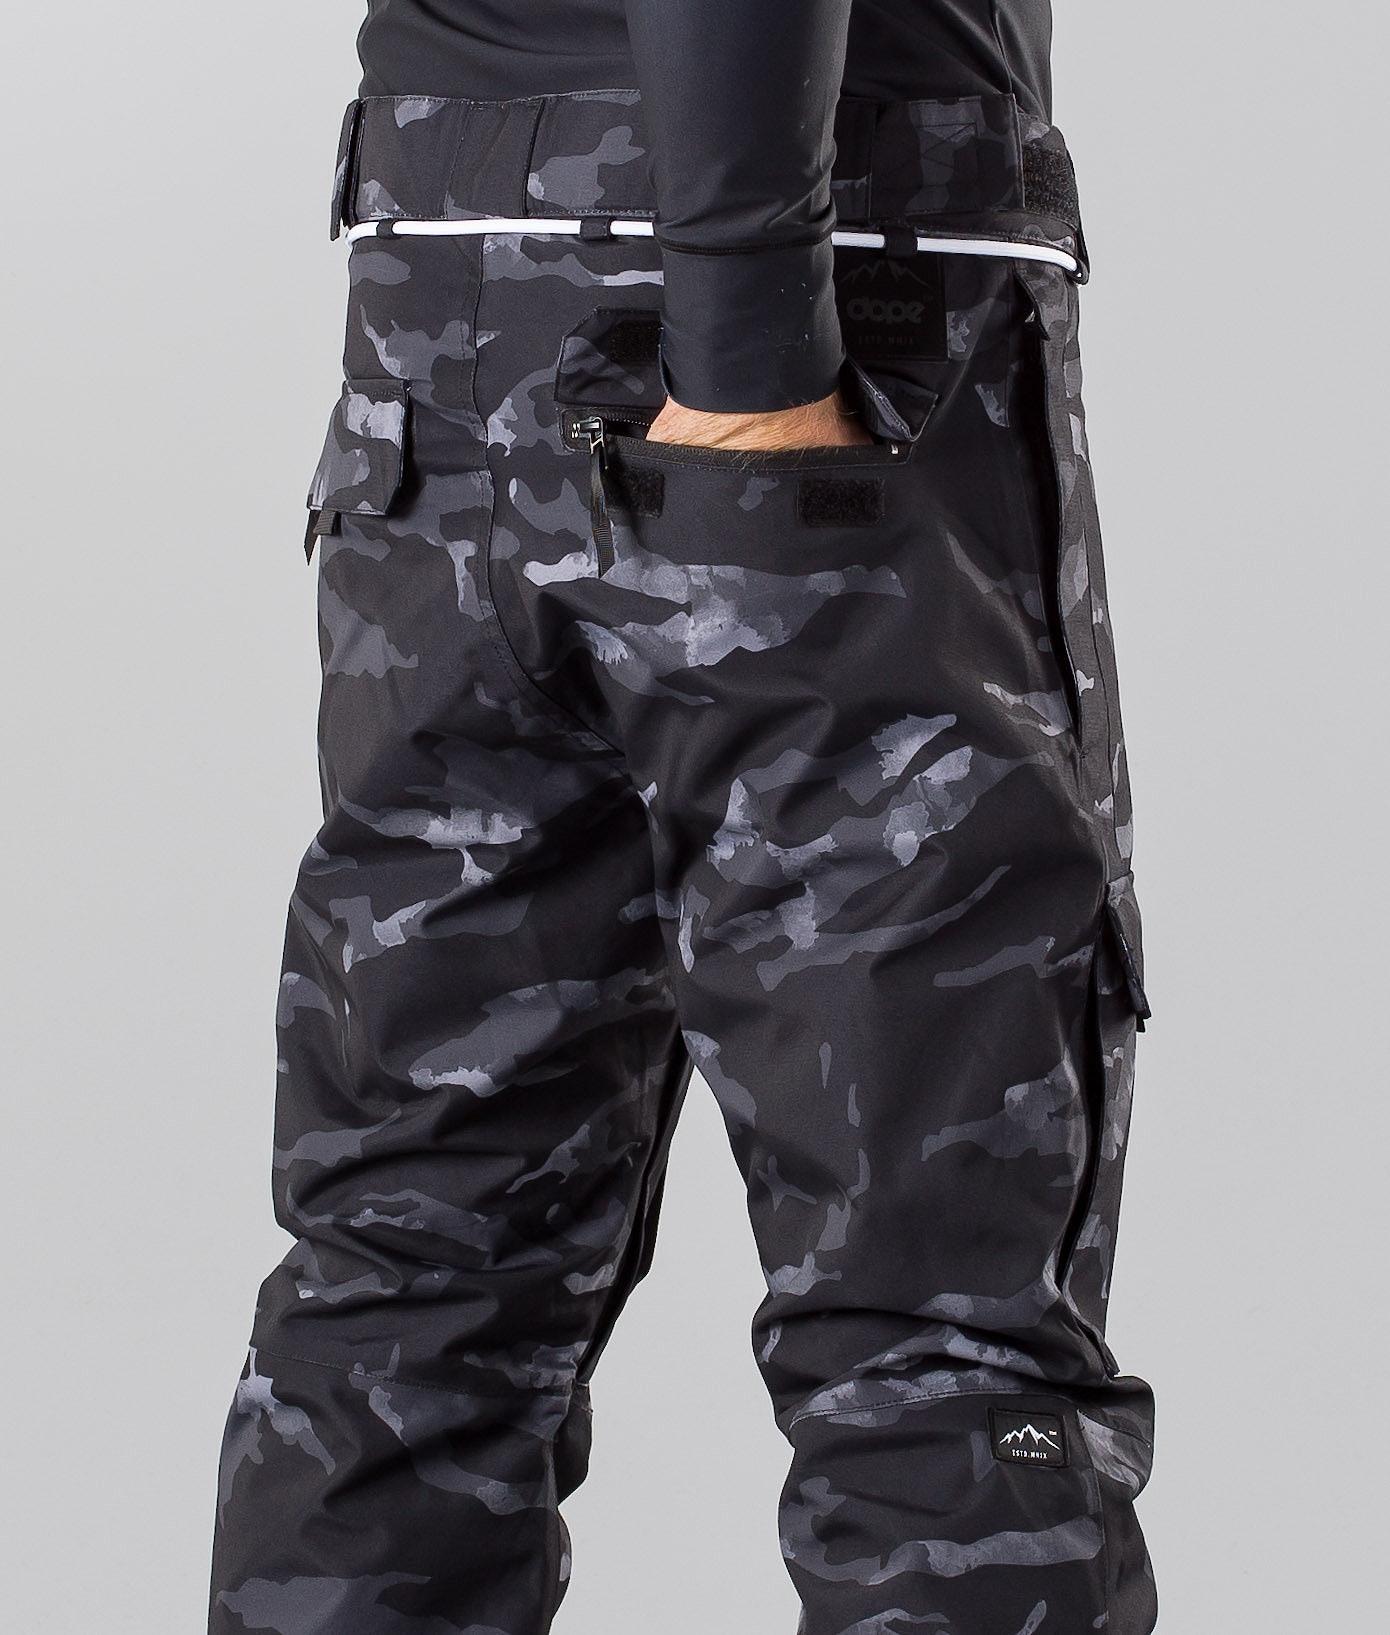 Dope Poise Ski Pants Black Camo - Ridestore.com 5b89773a866